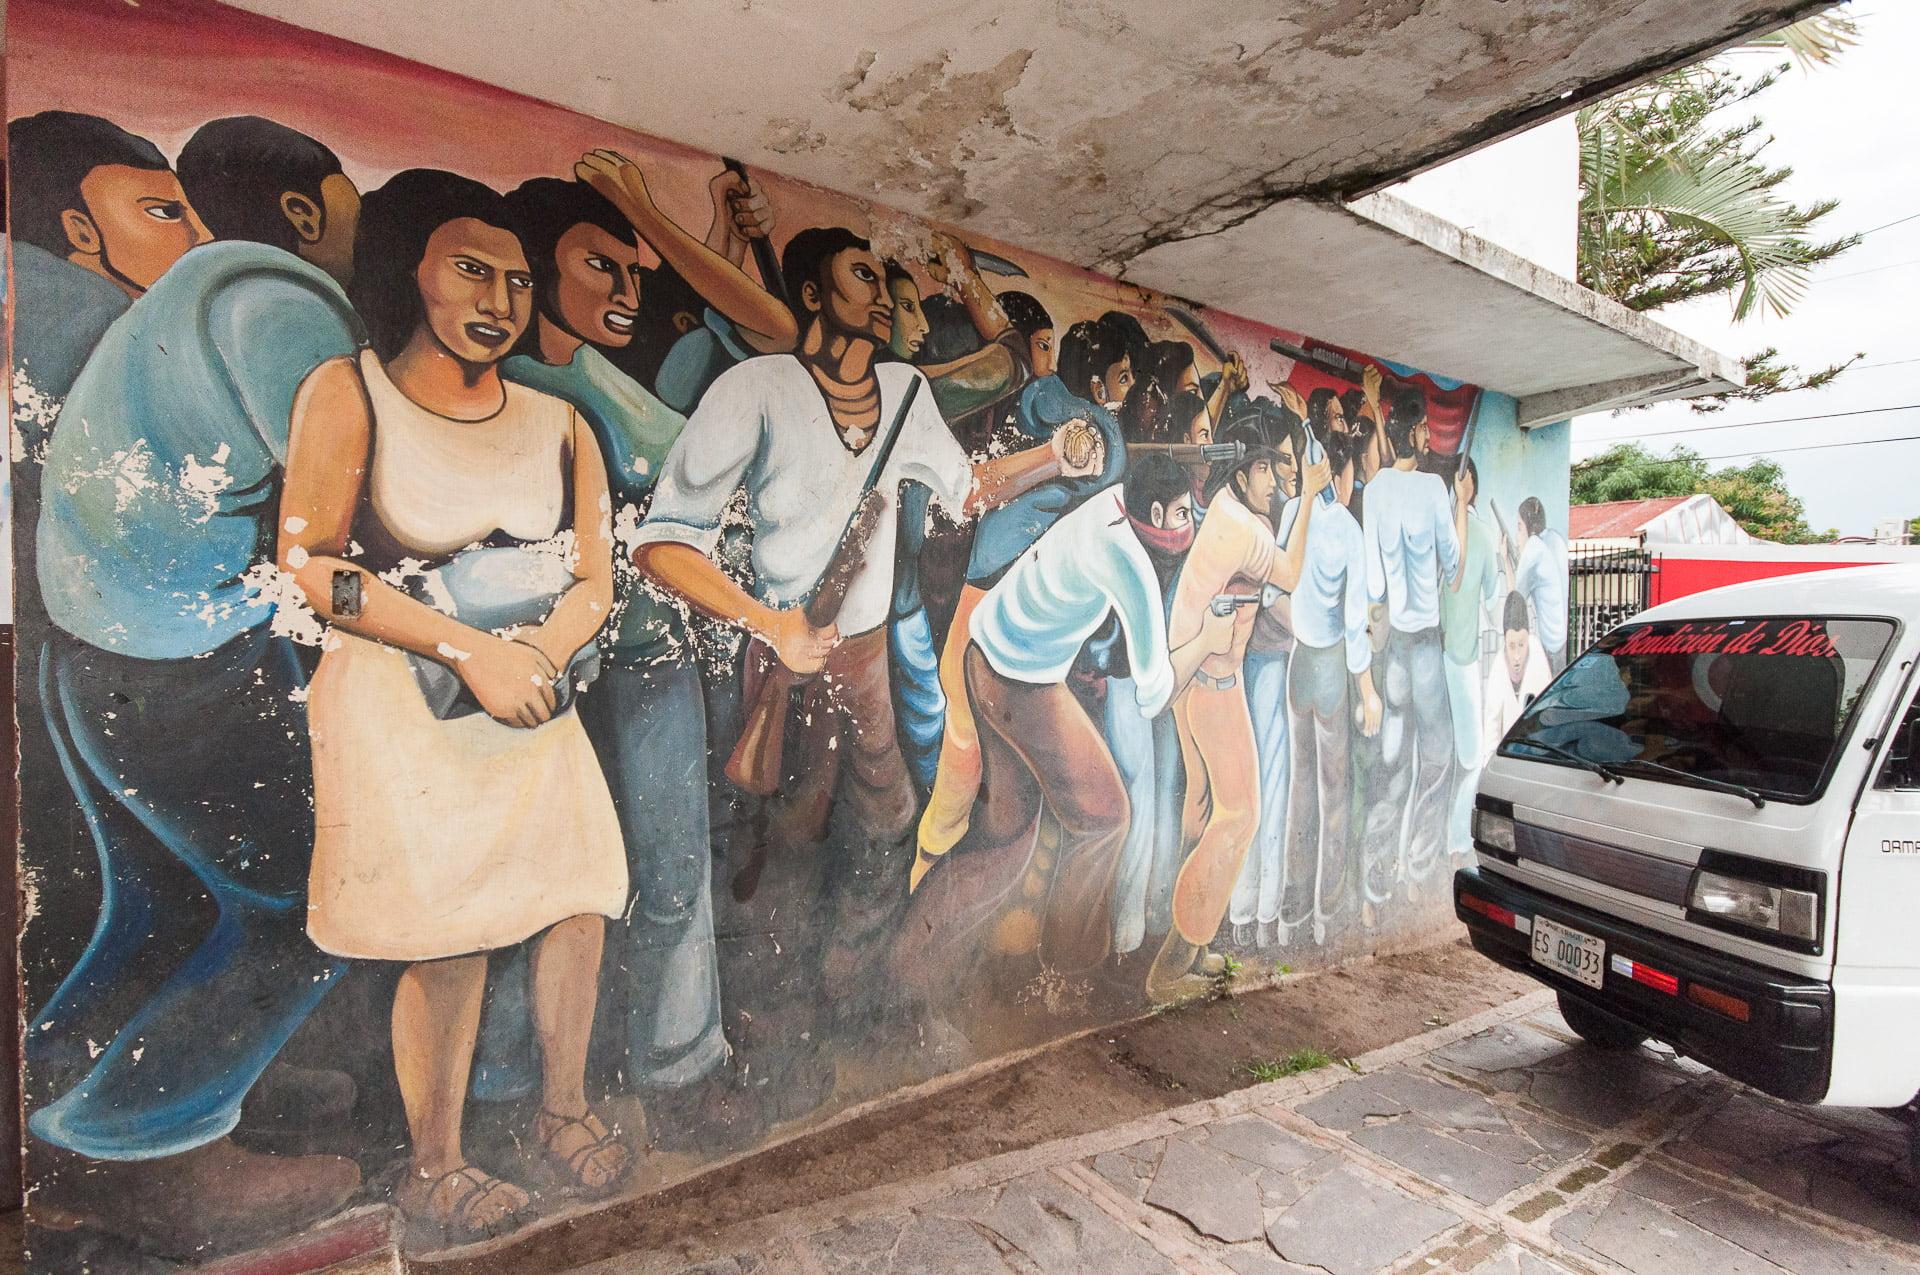 Murale du centre culturel d'Esteli